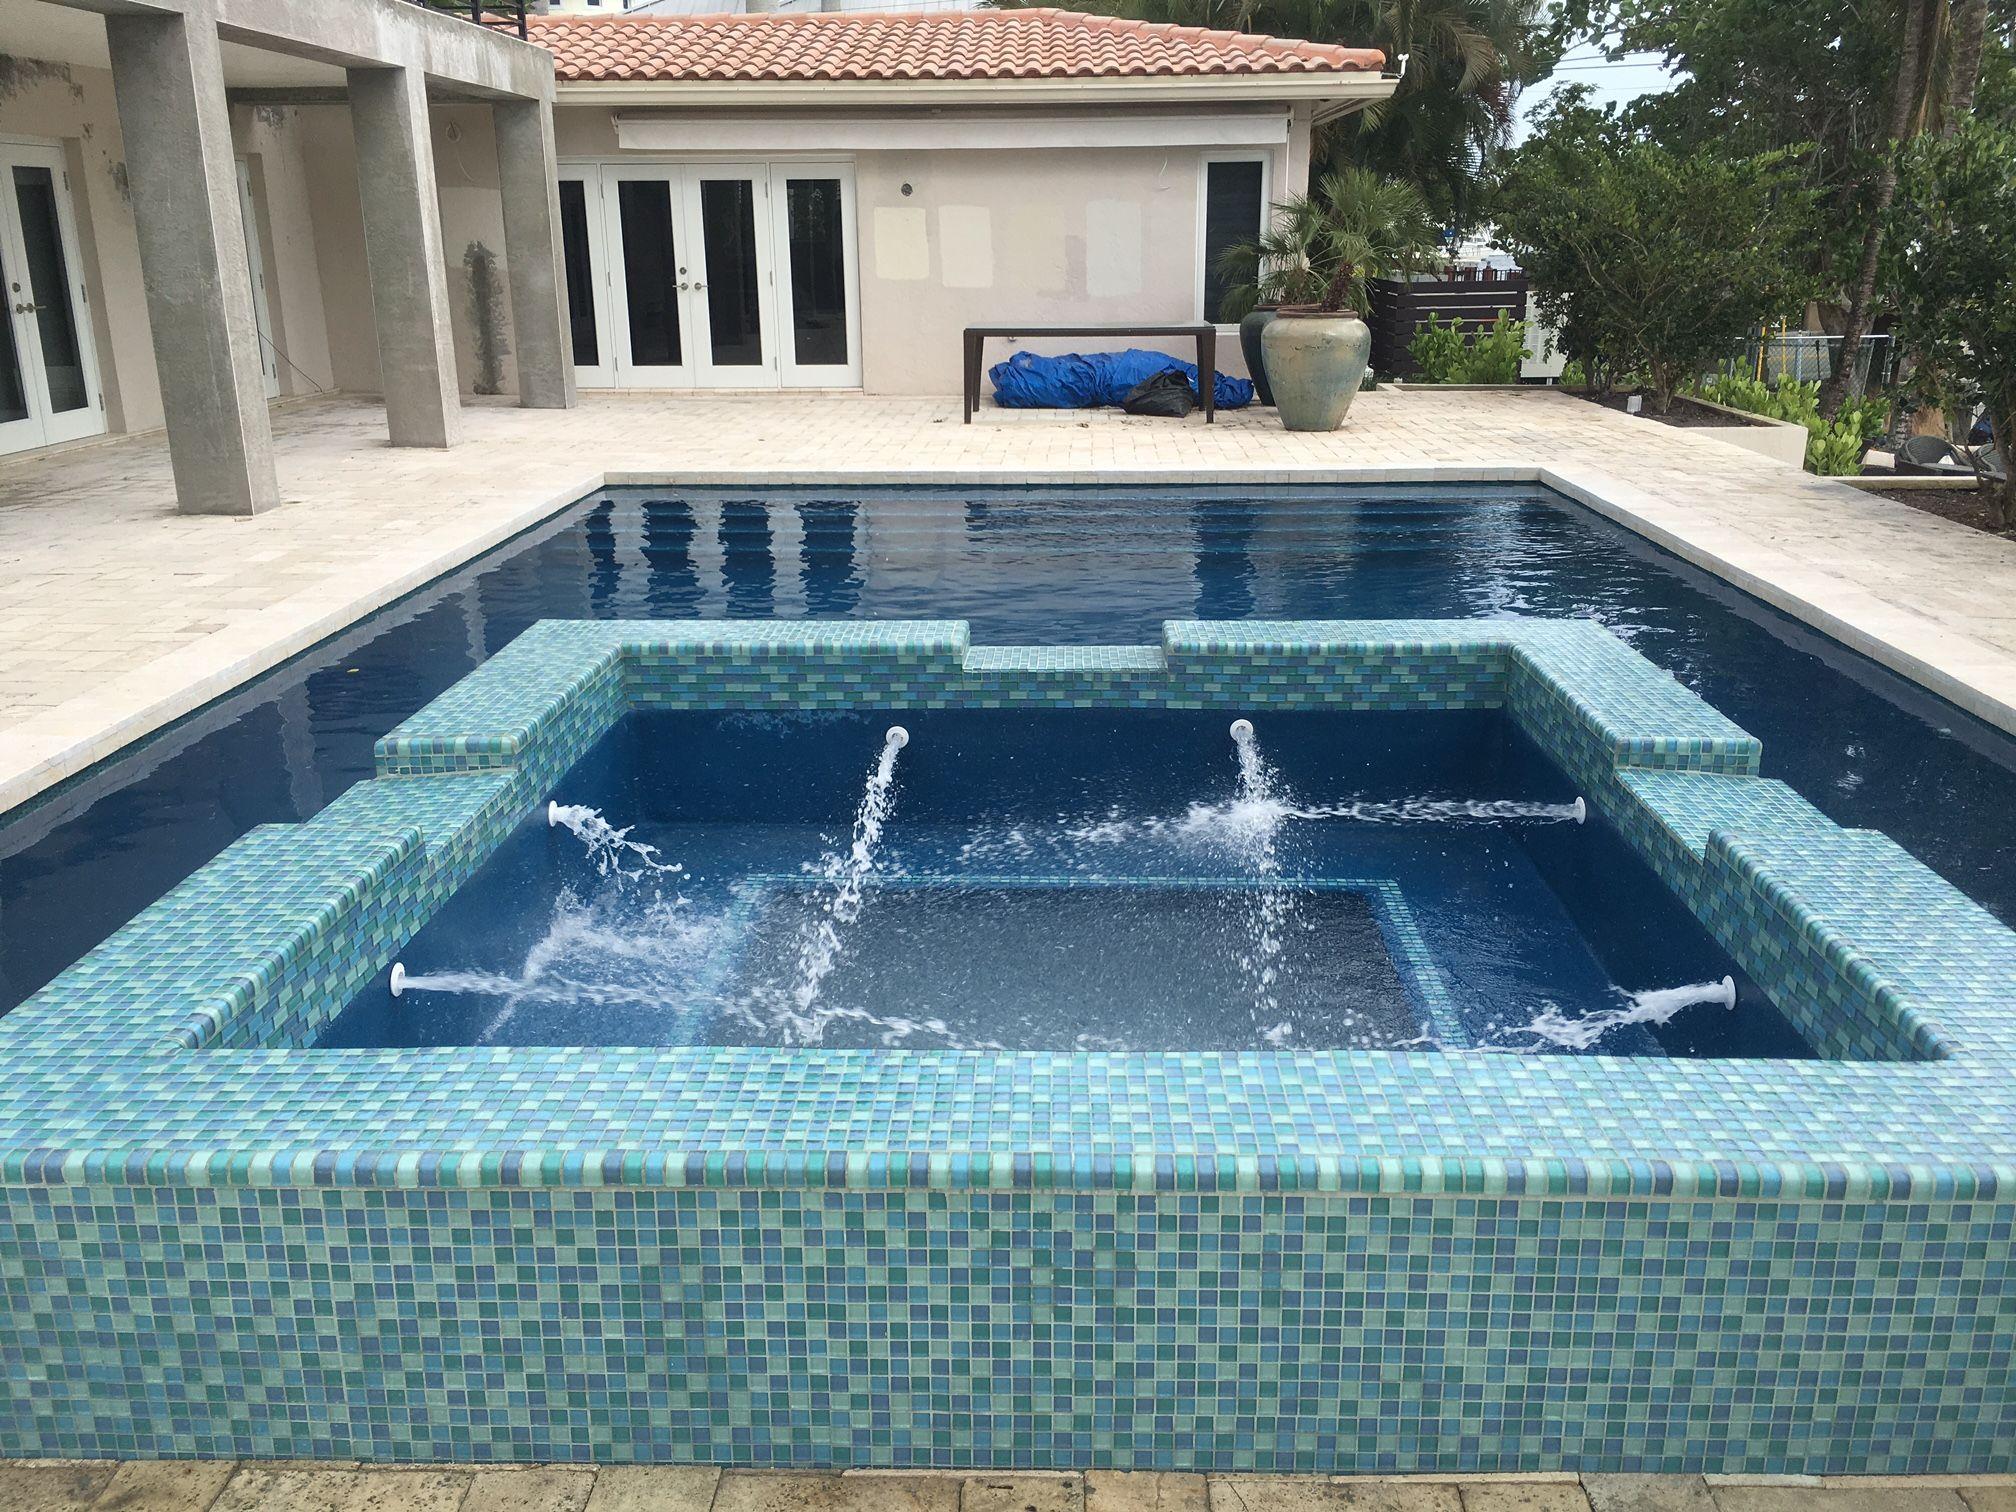 Younique Pool Renovations Repairs In Sunrise Fl 33351